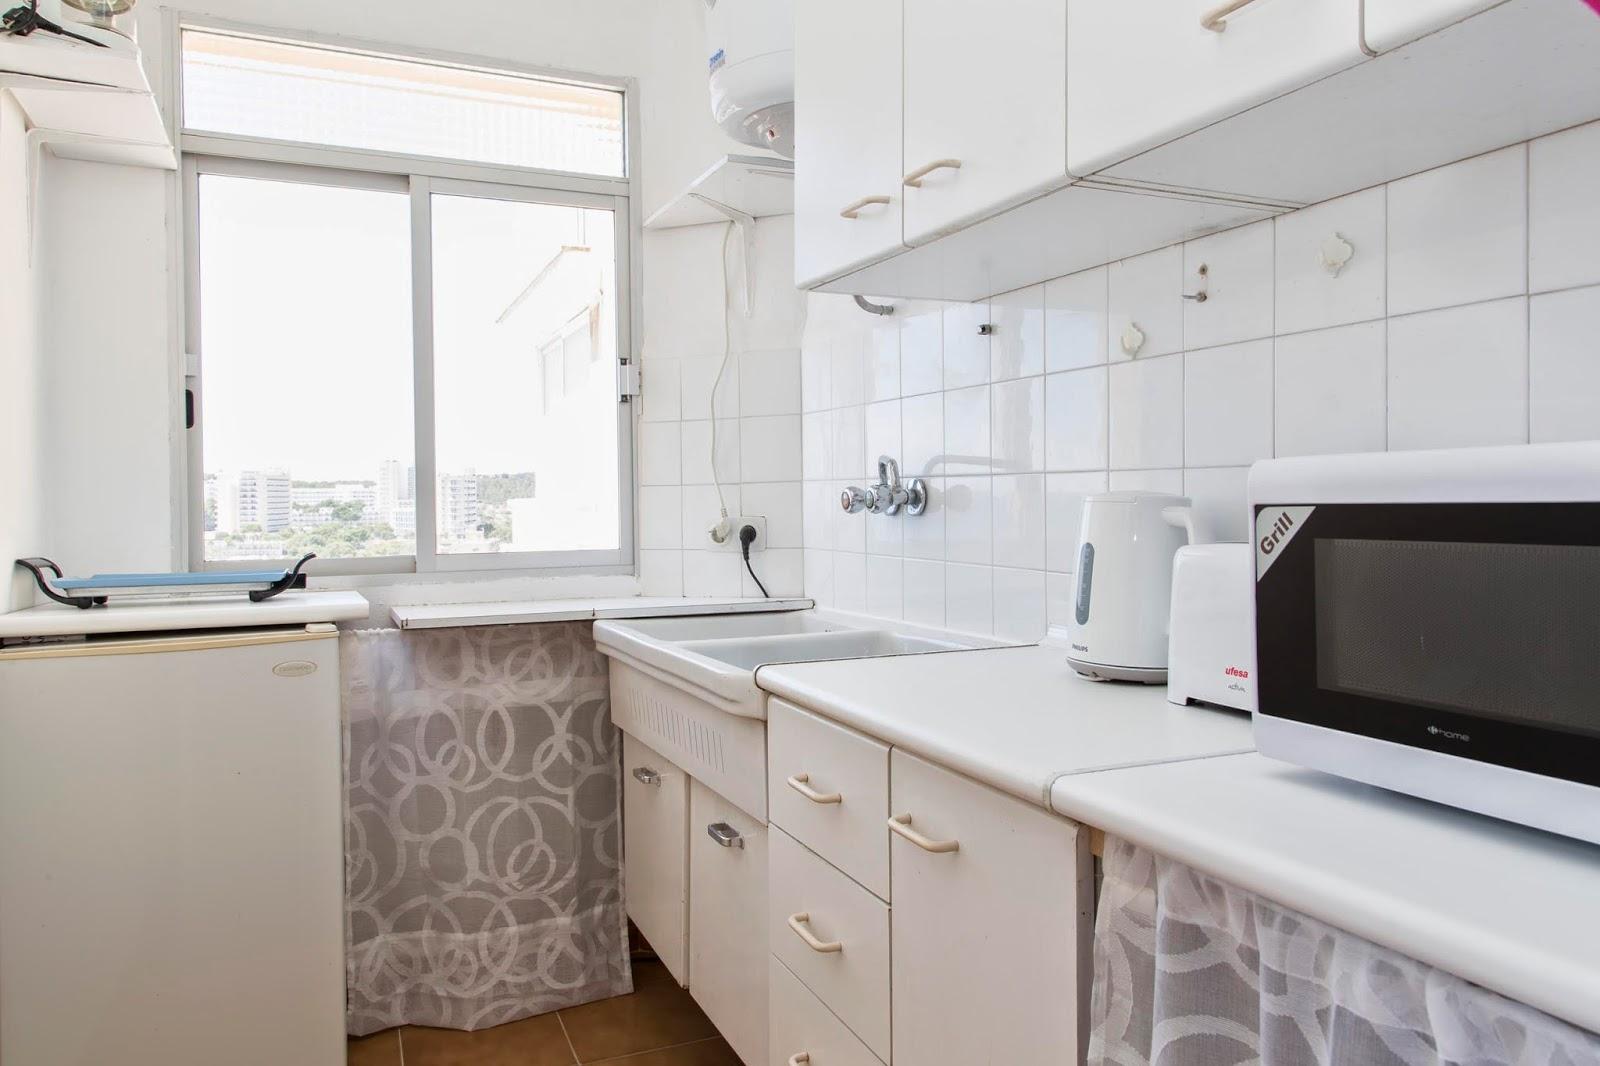 Майорка аренда вилл покупка дома в финляндии